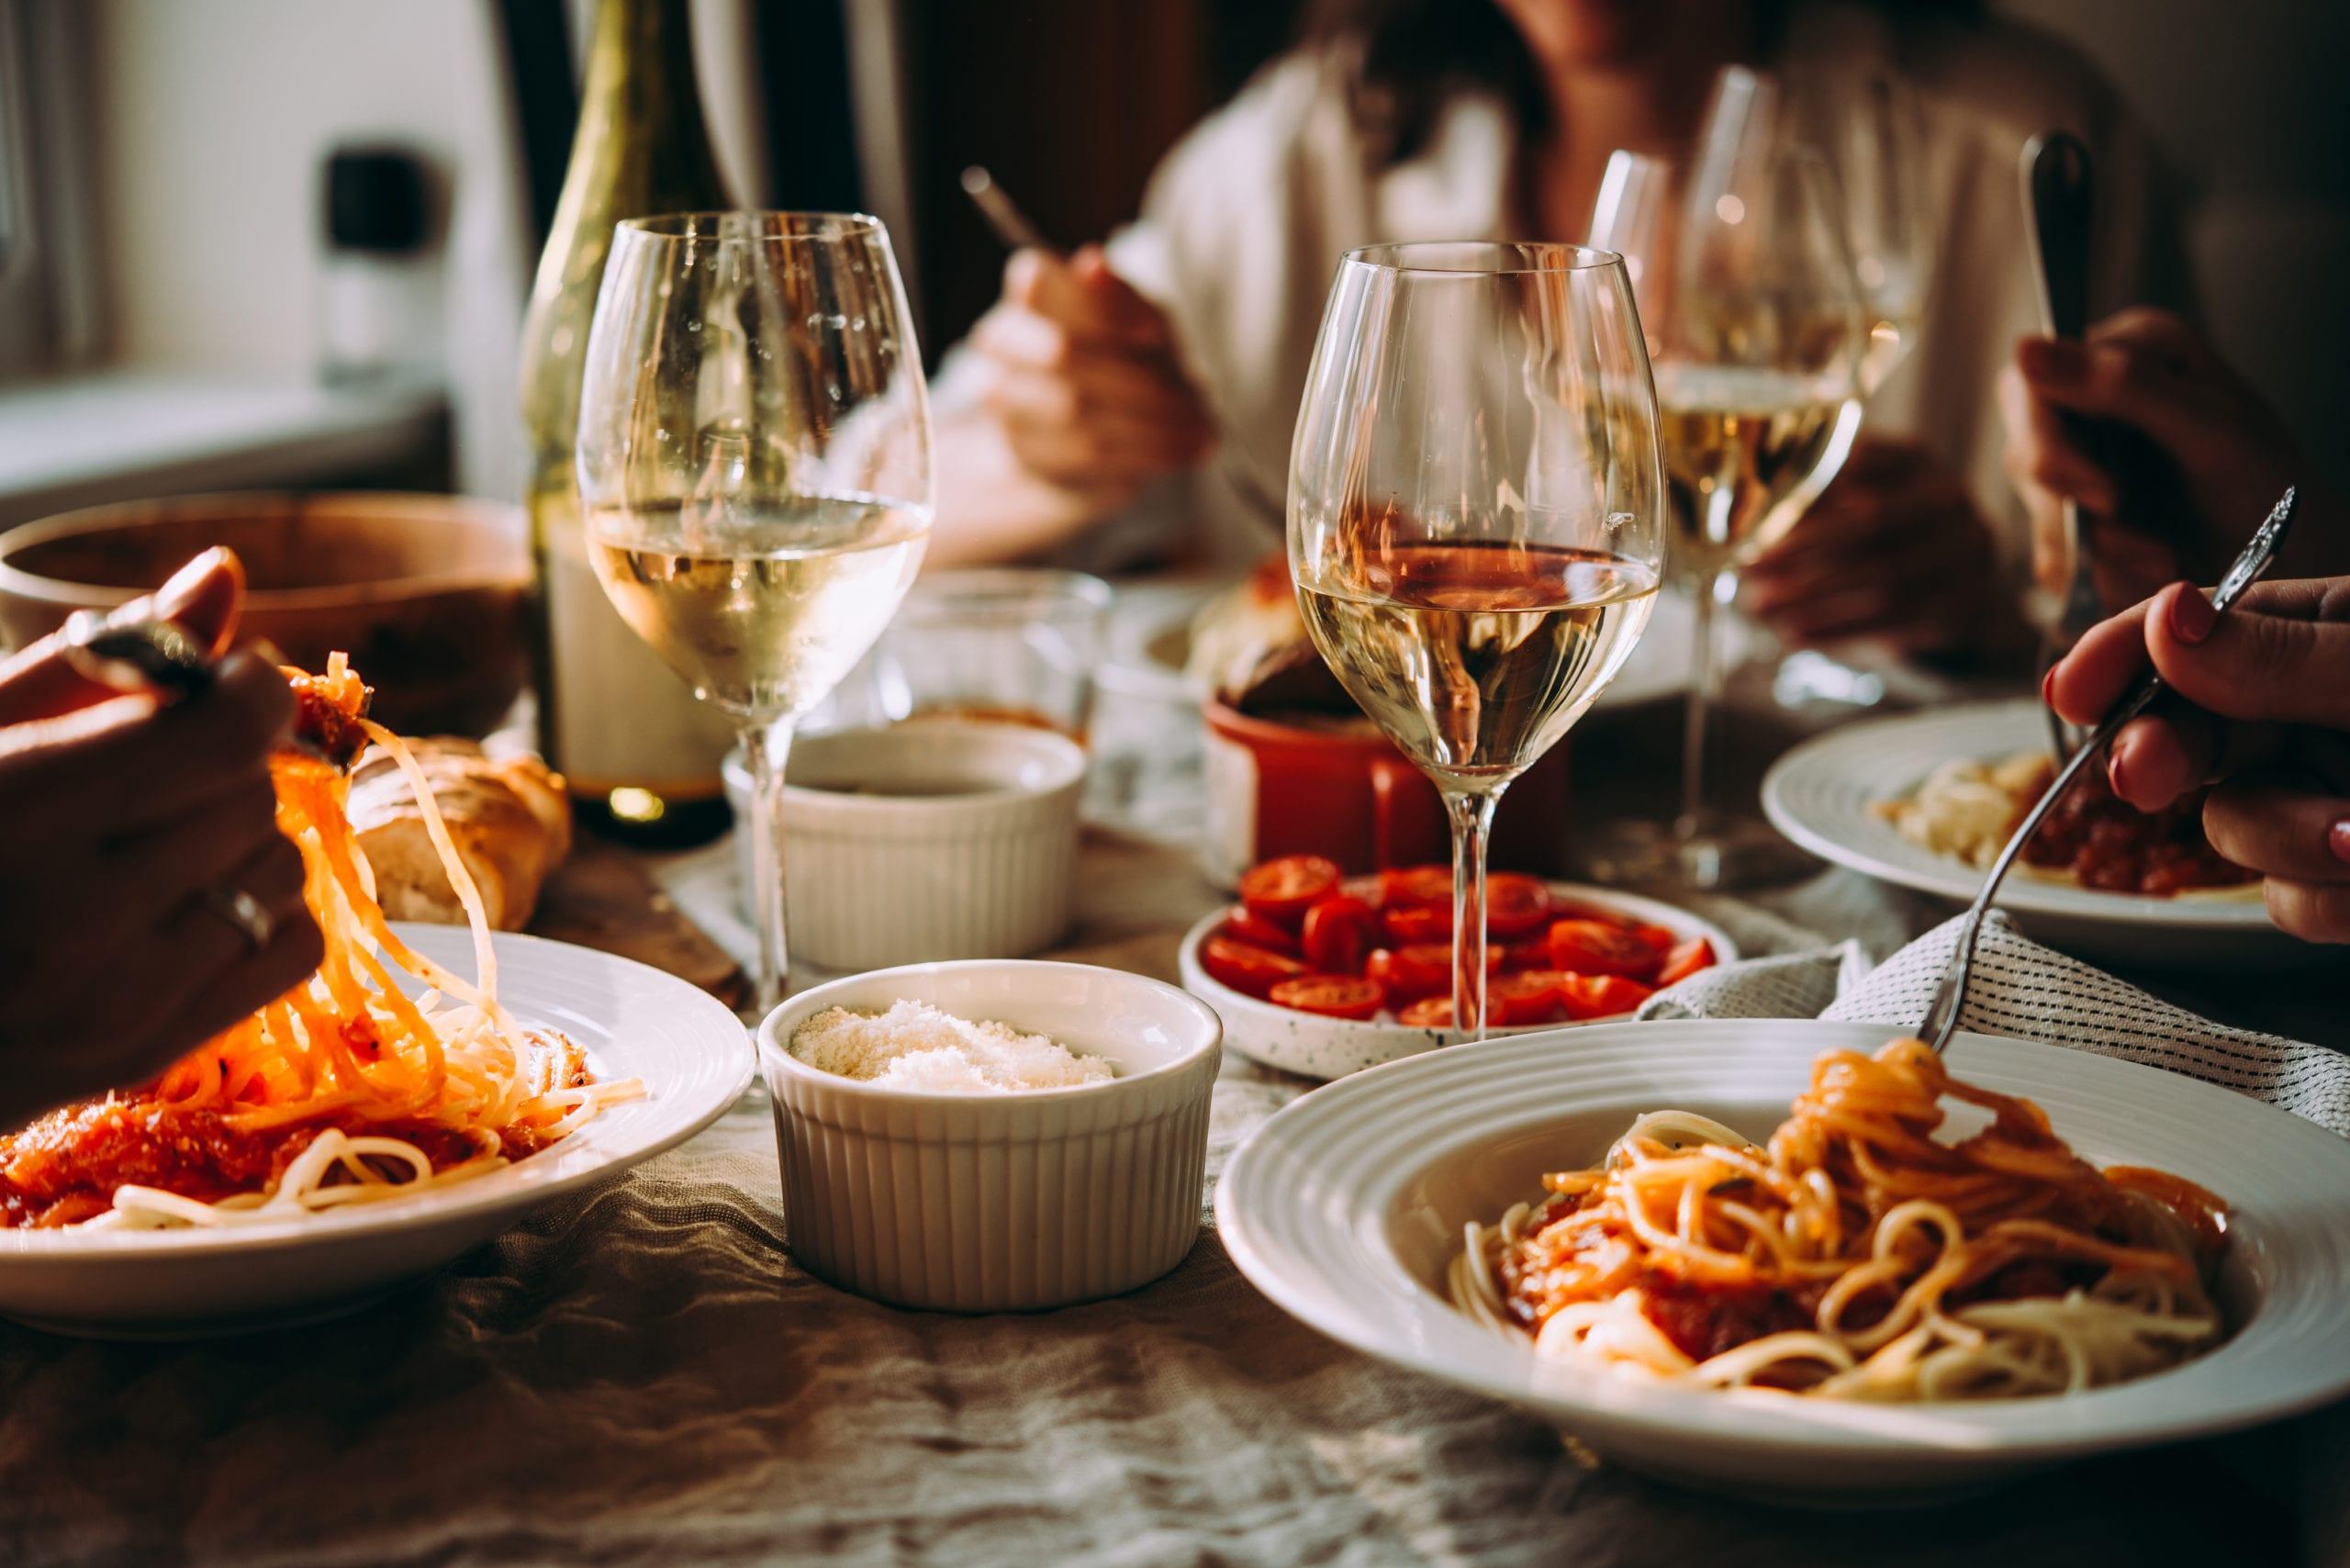 bar restaurant serving italian cuisine